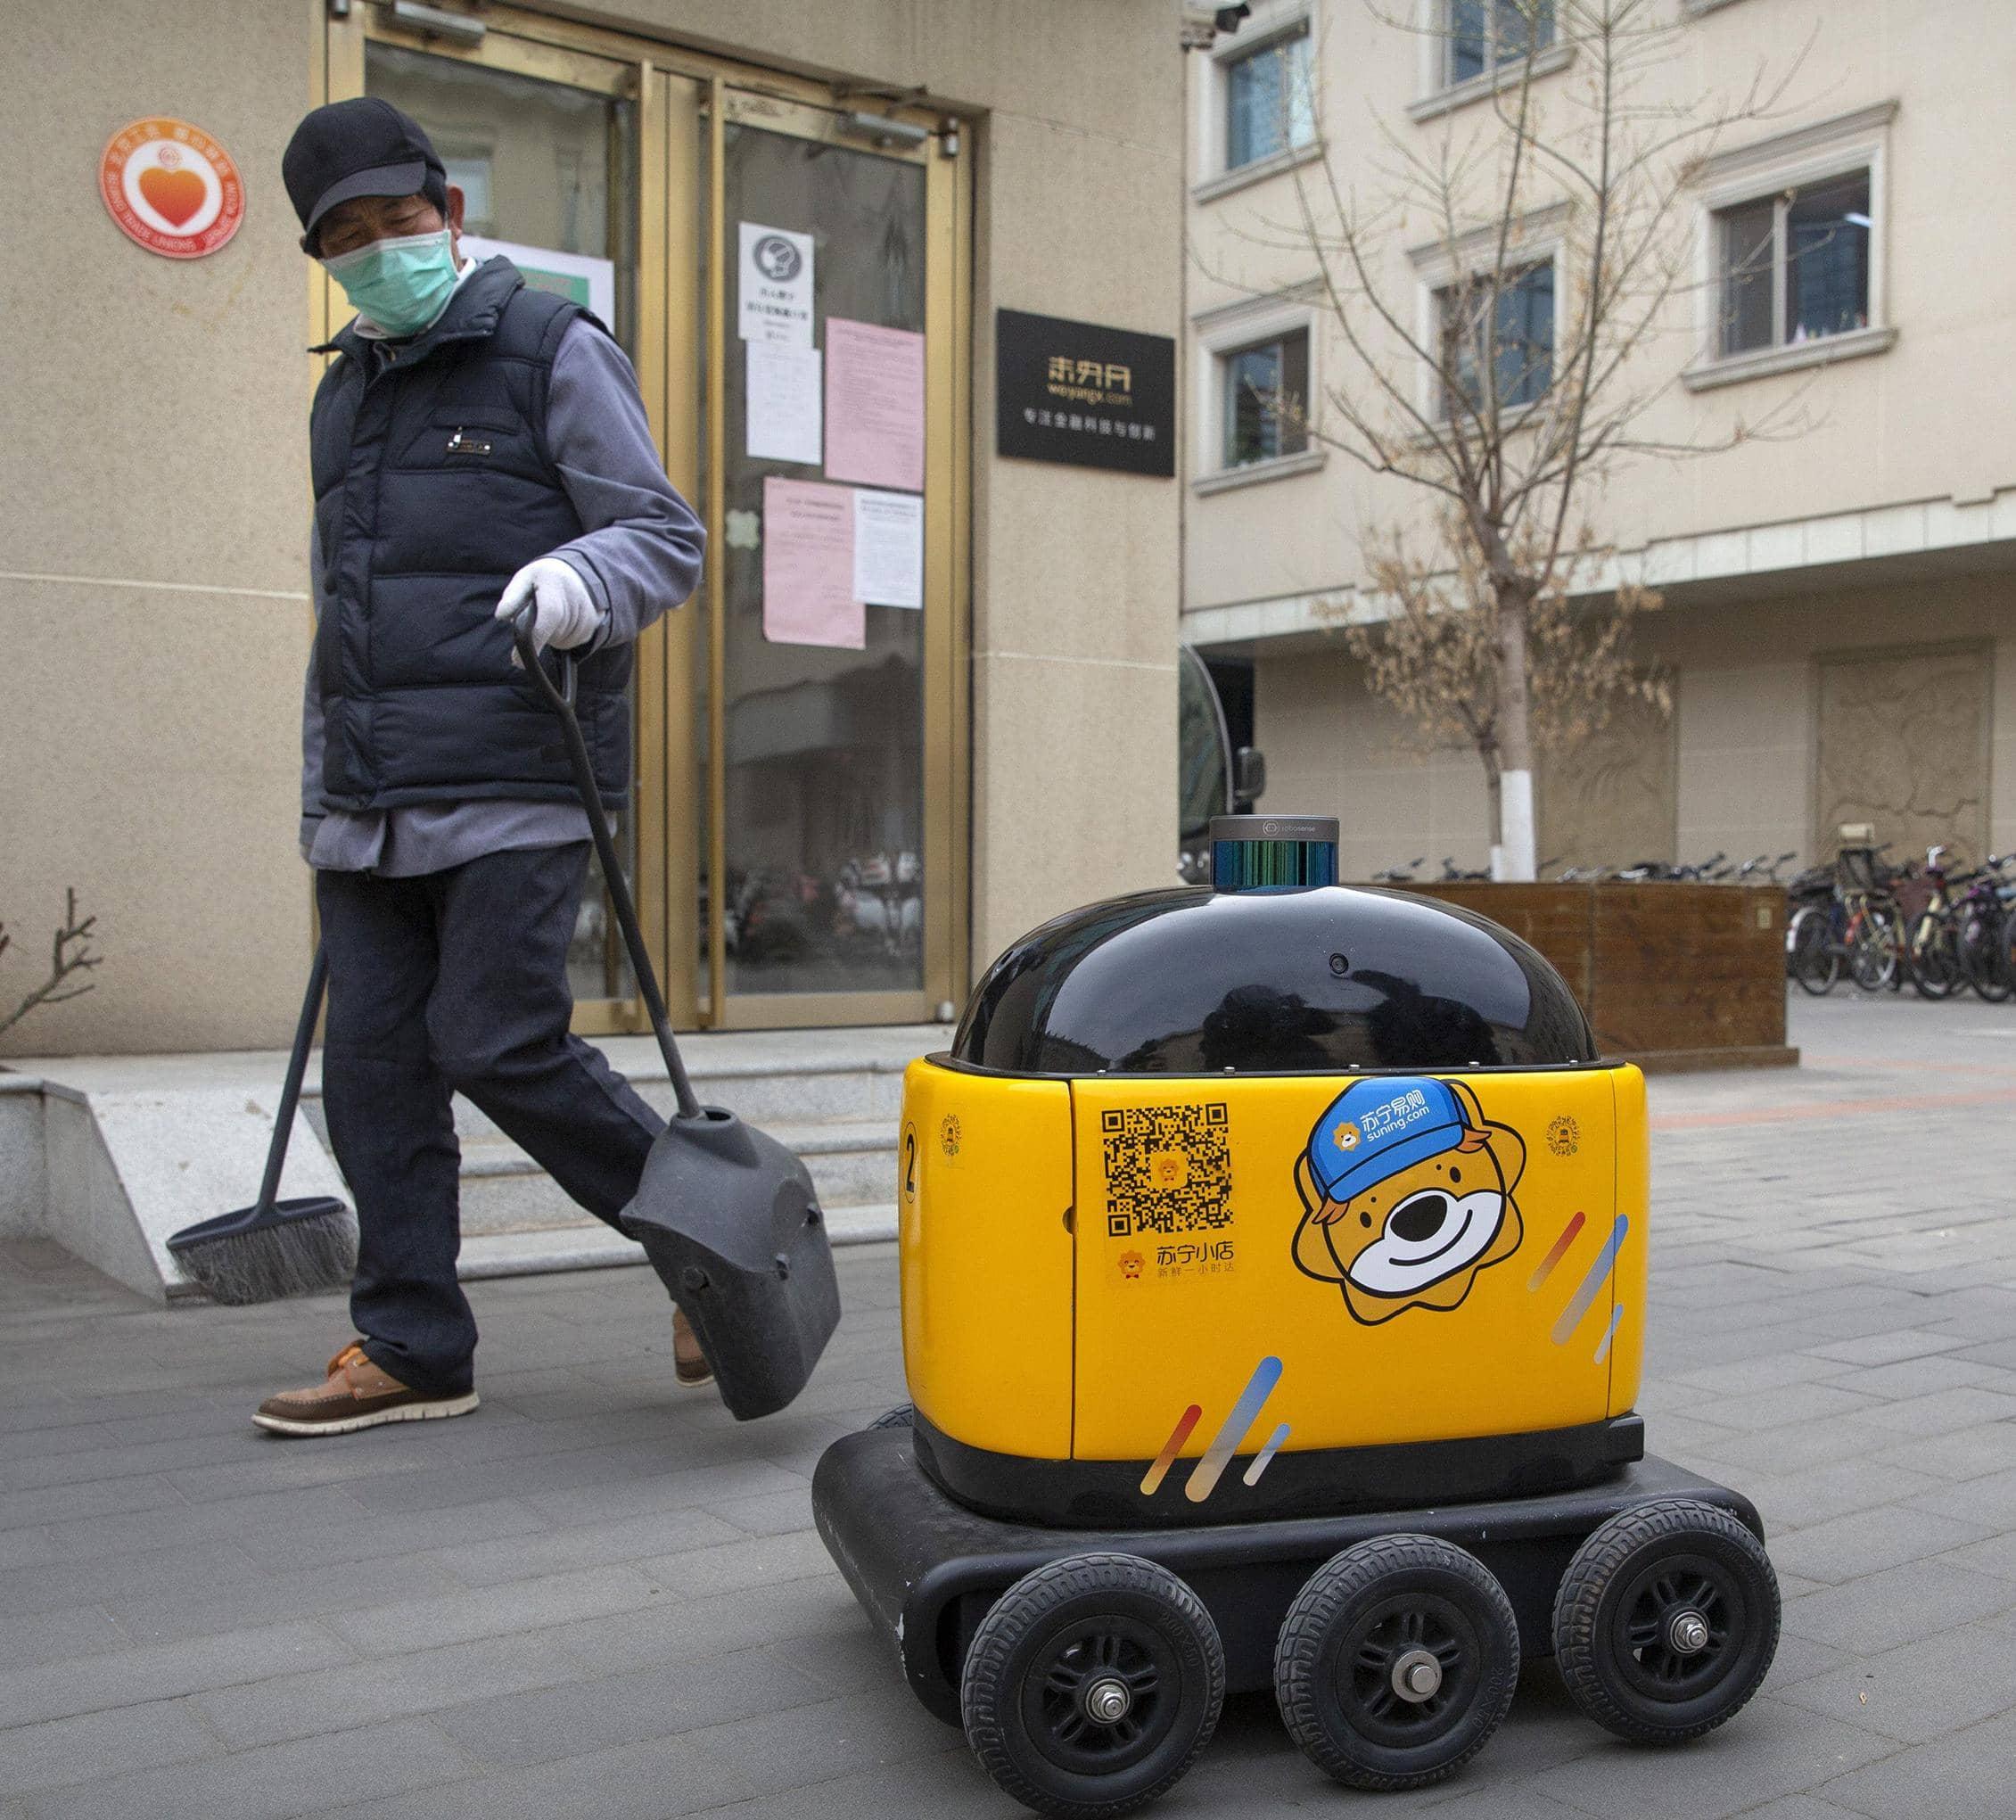 ROBOPONY: CHINESE ROBOT MAKER SEES DEMAND SURGE AMID VIRUS